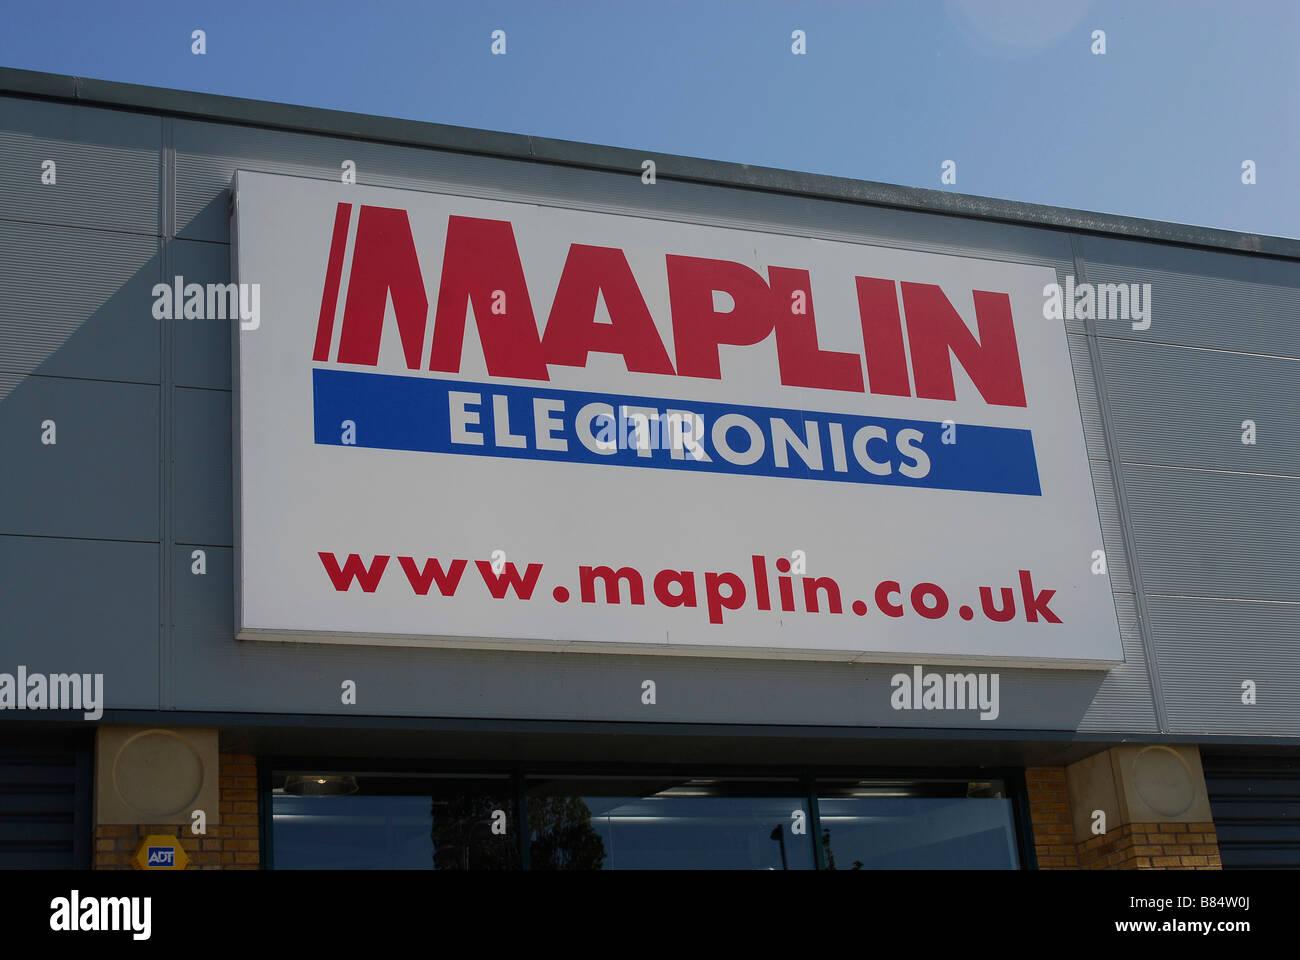 Maplin Electronics - Stock Image